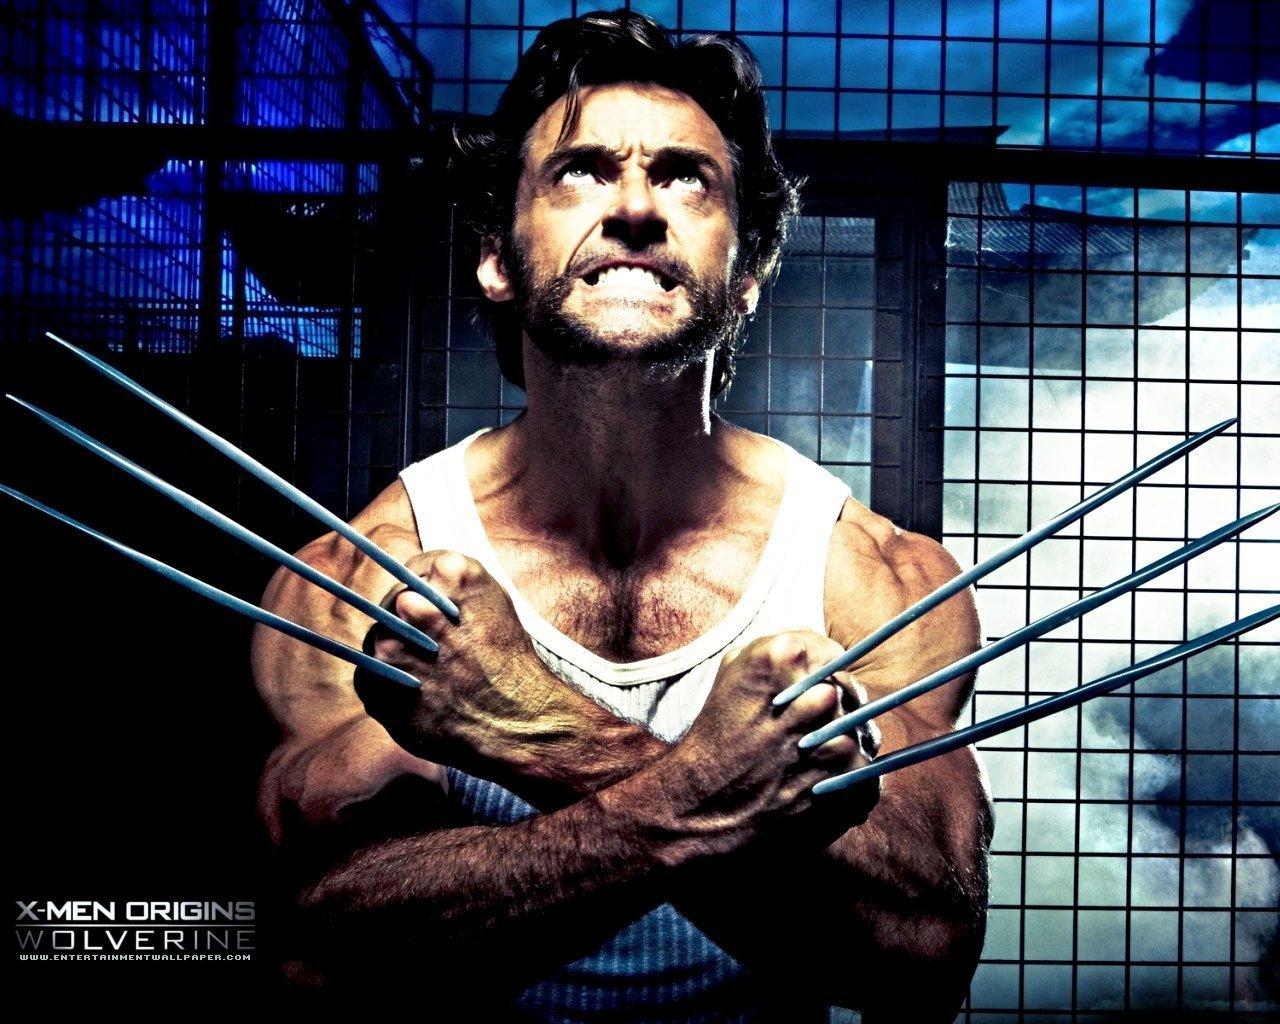 Film In Uscita Immagini X Men Origins Wolverine Wallpaper Hd